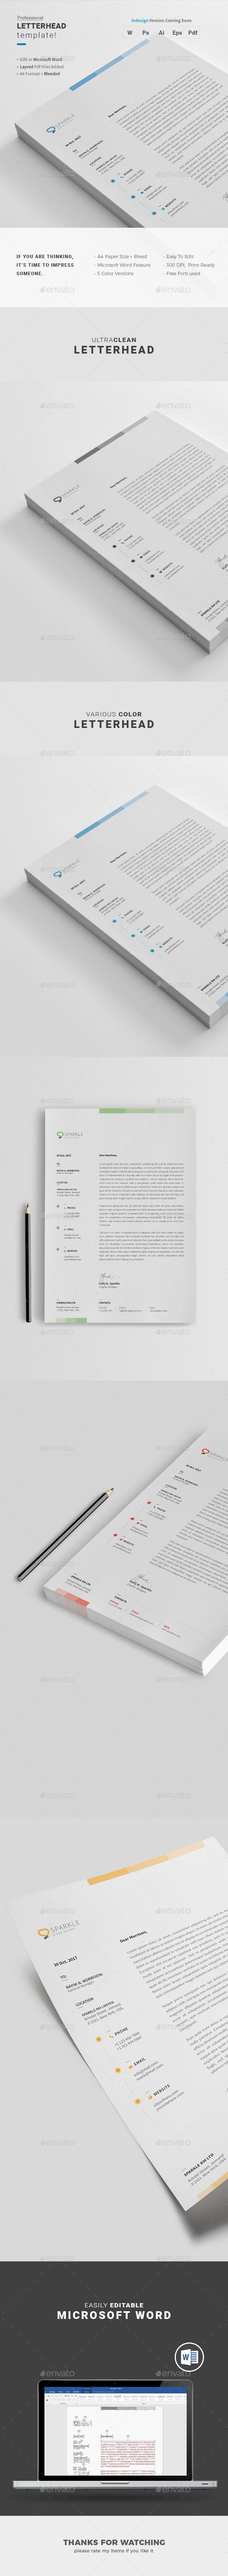 Free Microsoft Word Letterhead Templates Glamorous 47 Best Letterhead Images On Pinterest  Design Patterns Design .